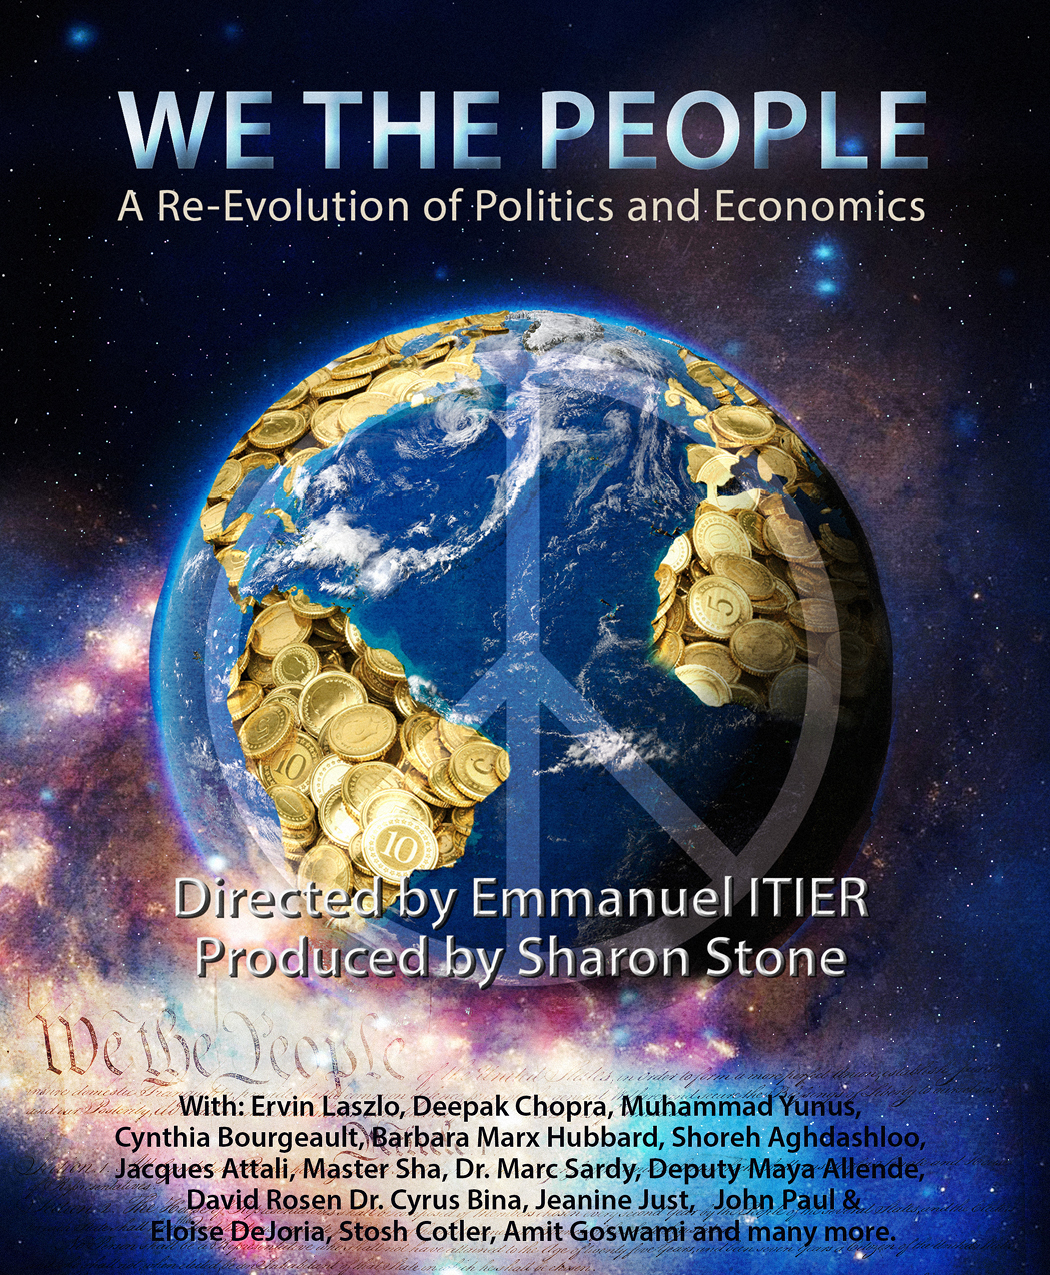 WE THE PEOPLE_3.5X4.25_300dpi.jpg